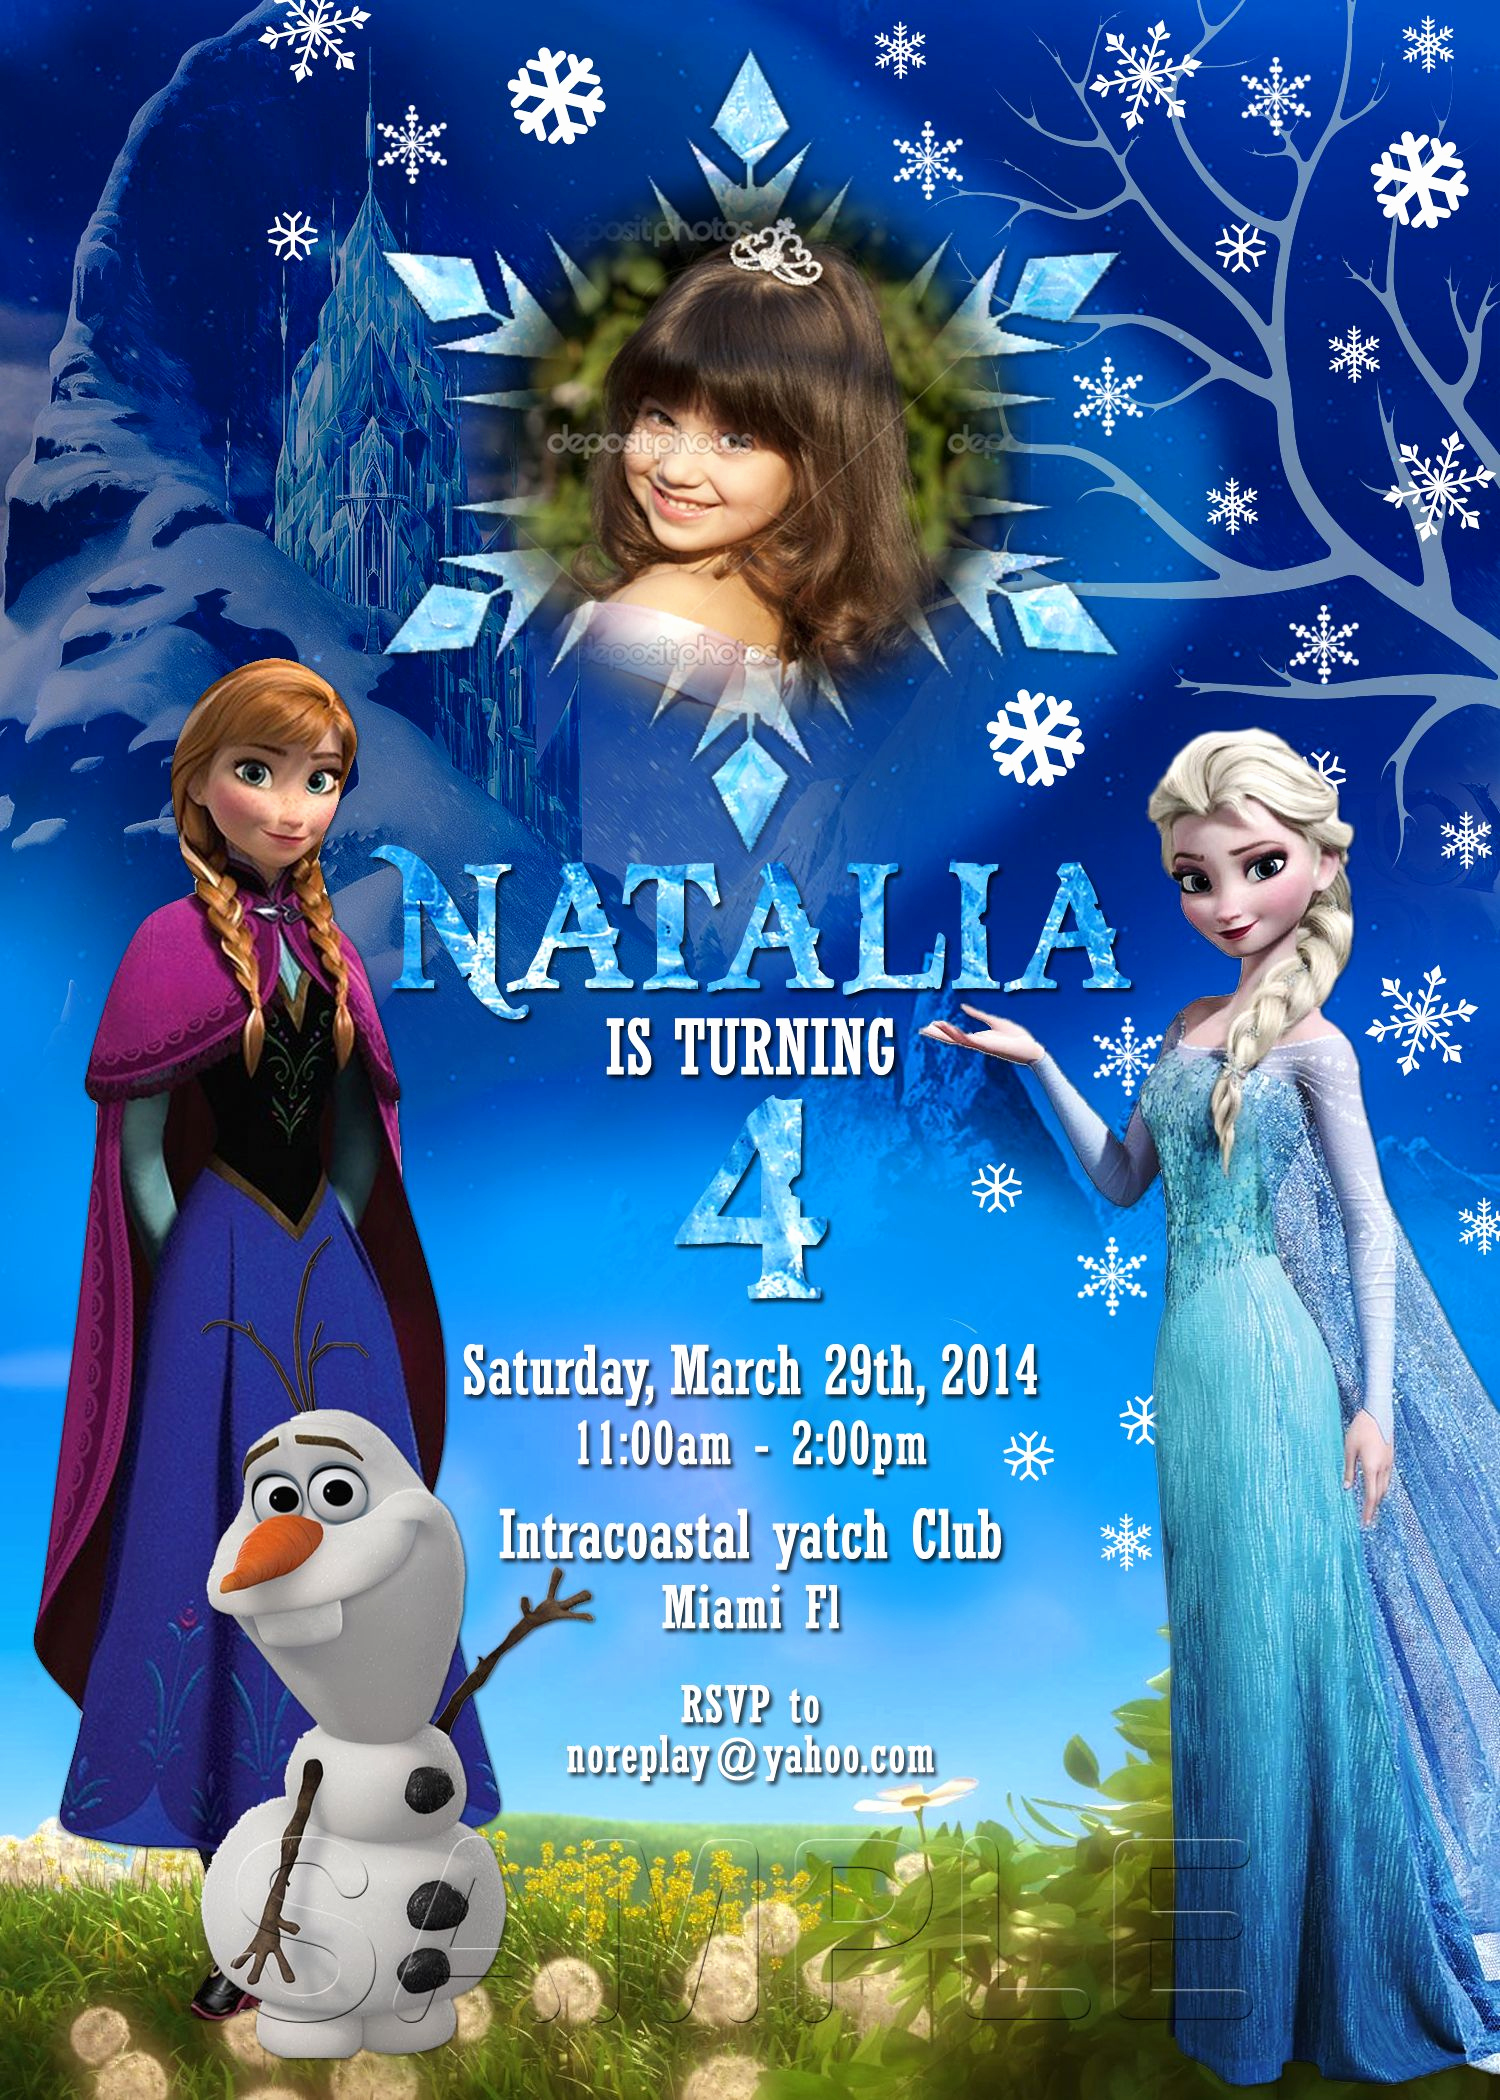 Free Frozen Invitation Templates Best Of Free Dyi Photo Frozen Bday Invitation Templates Google